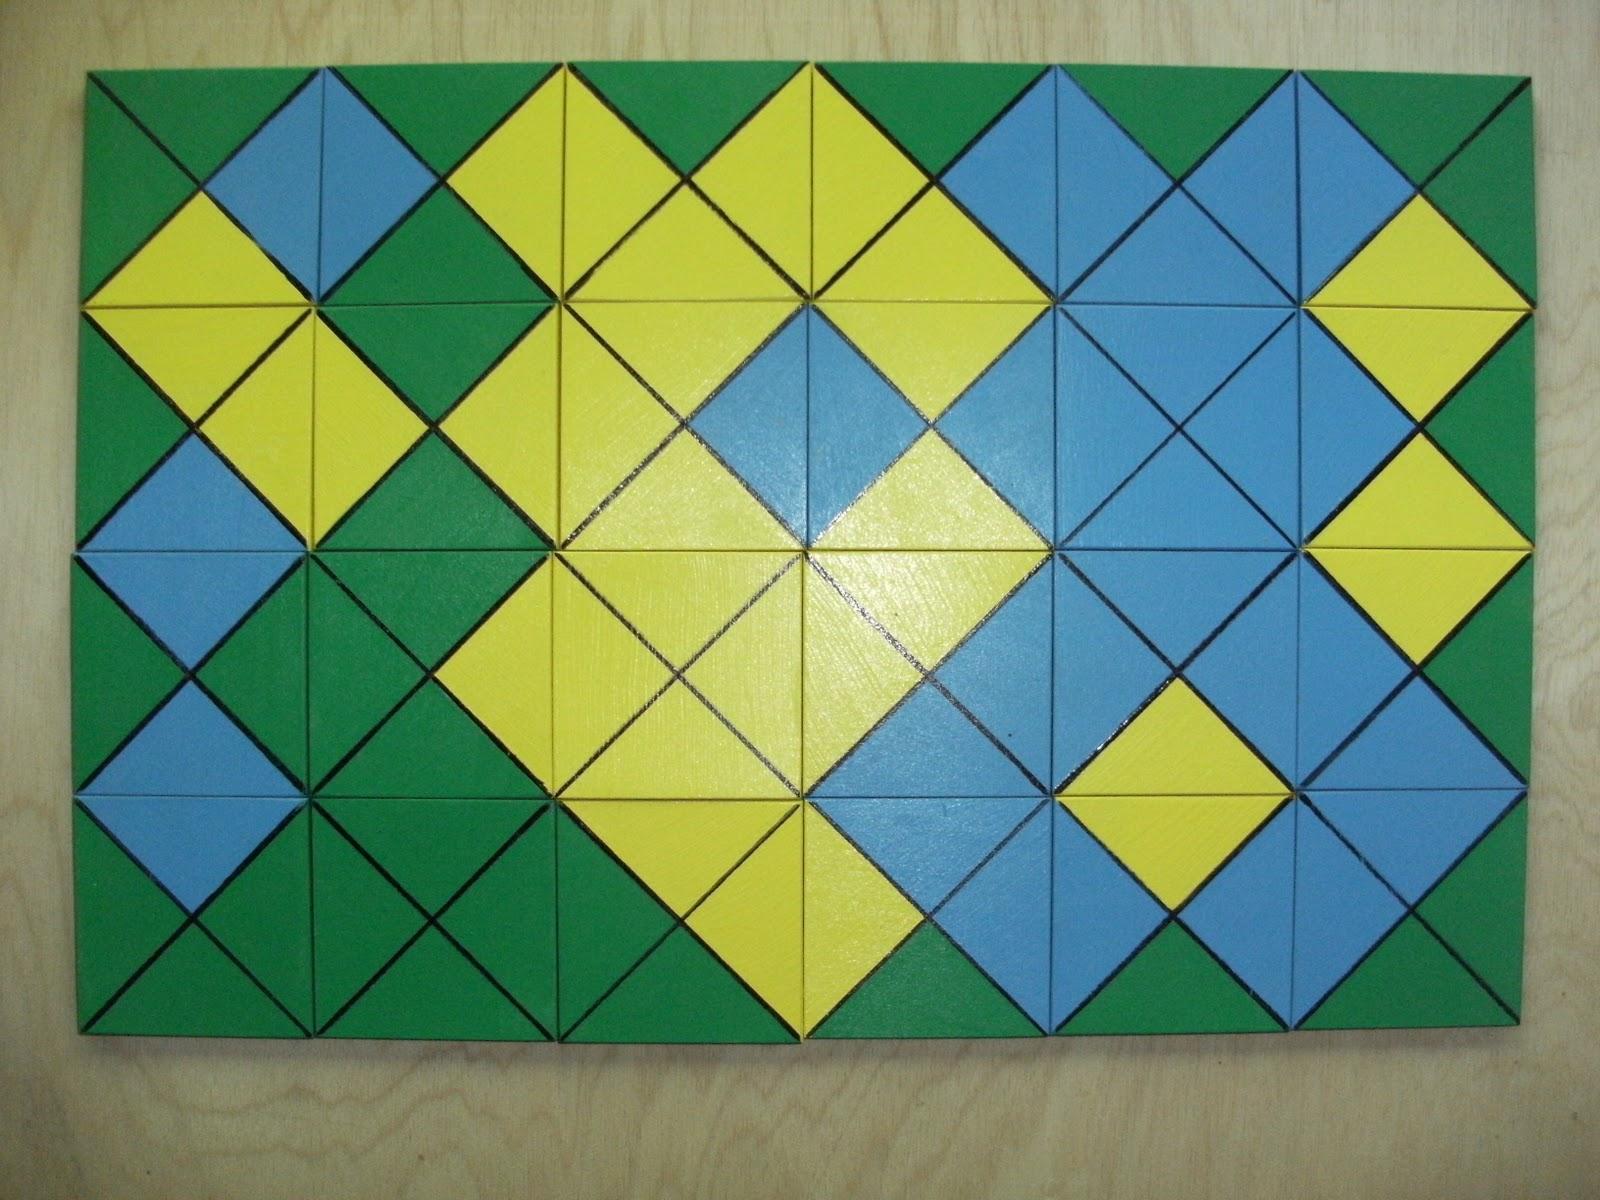 MacMahon 3-Color Squares | Math on the McKenzie